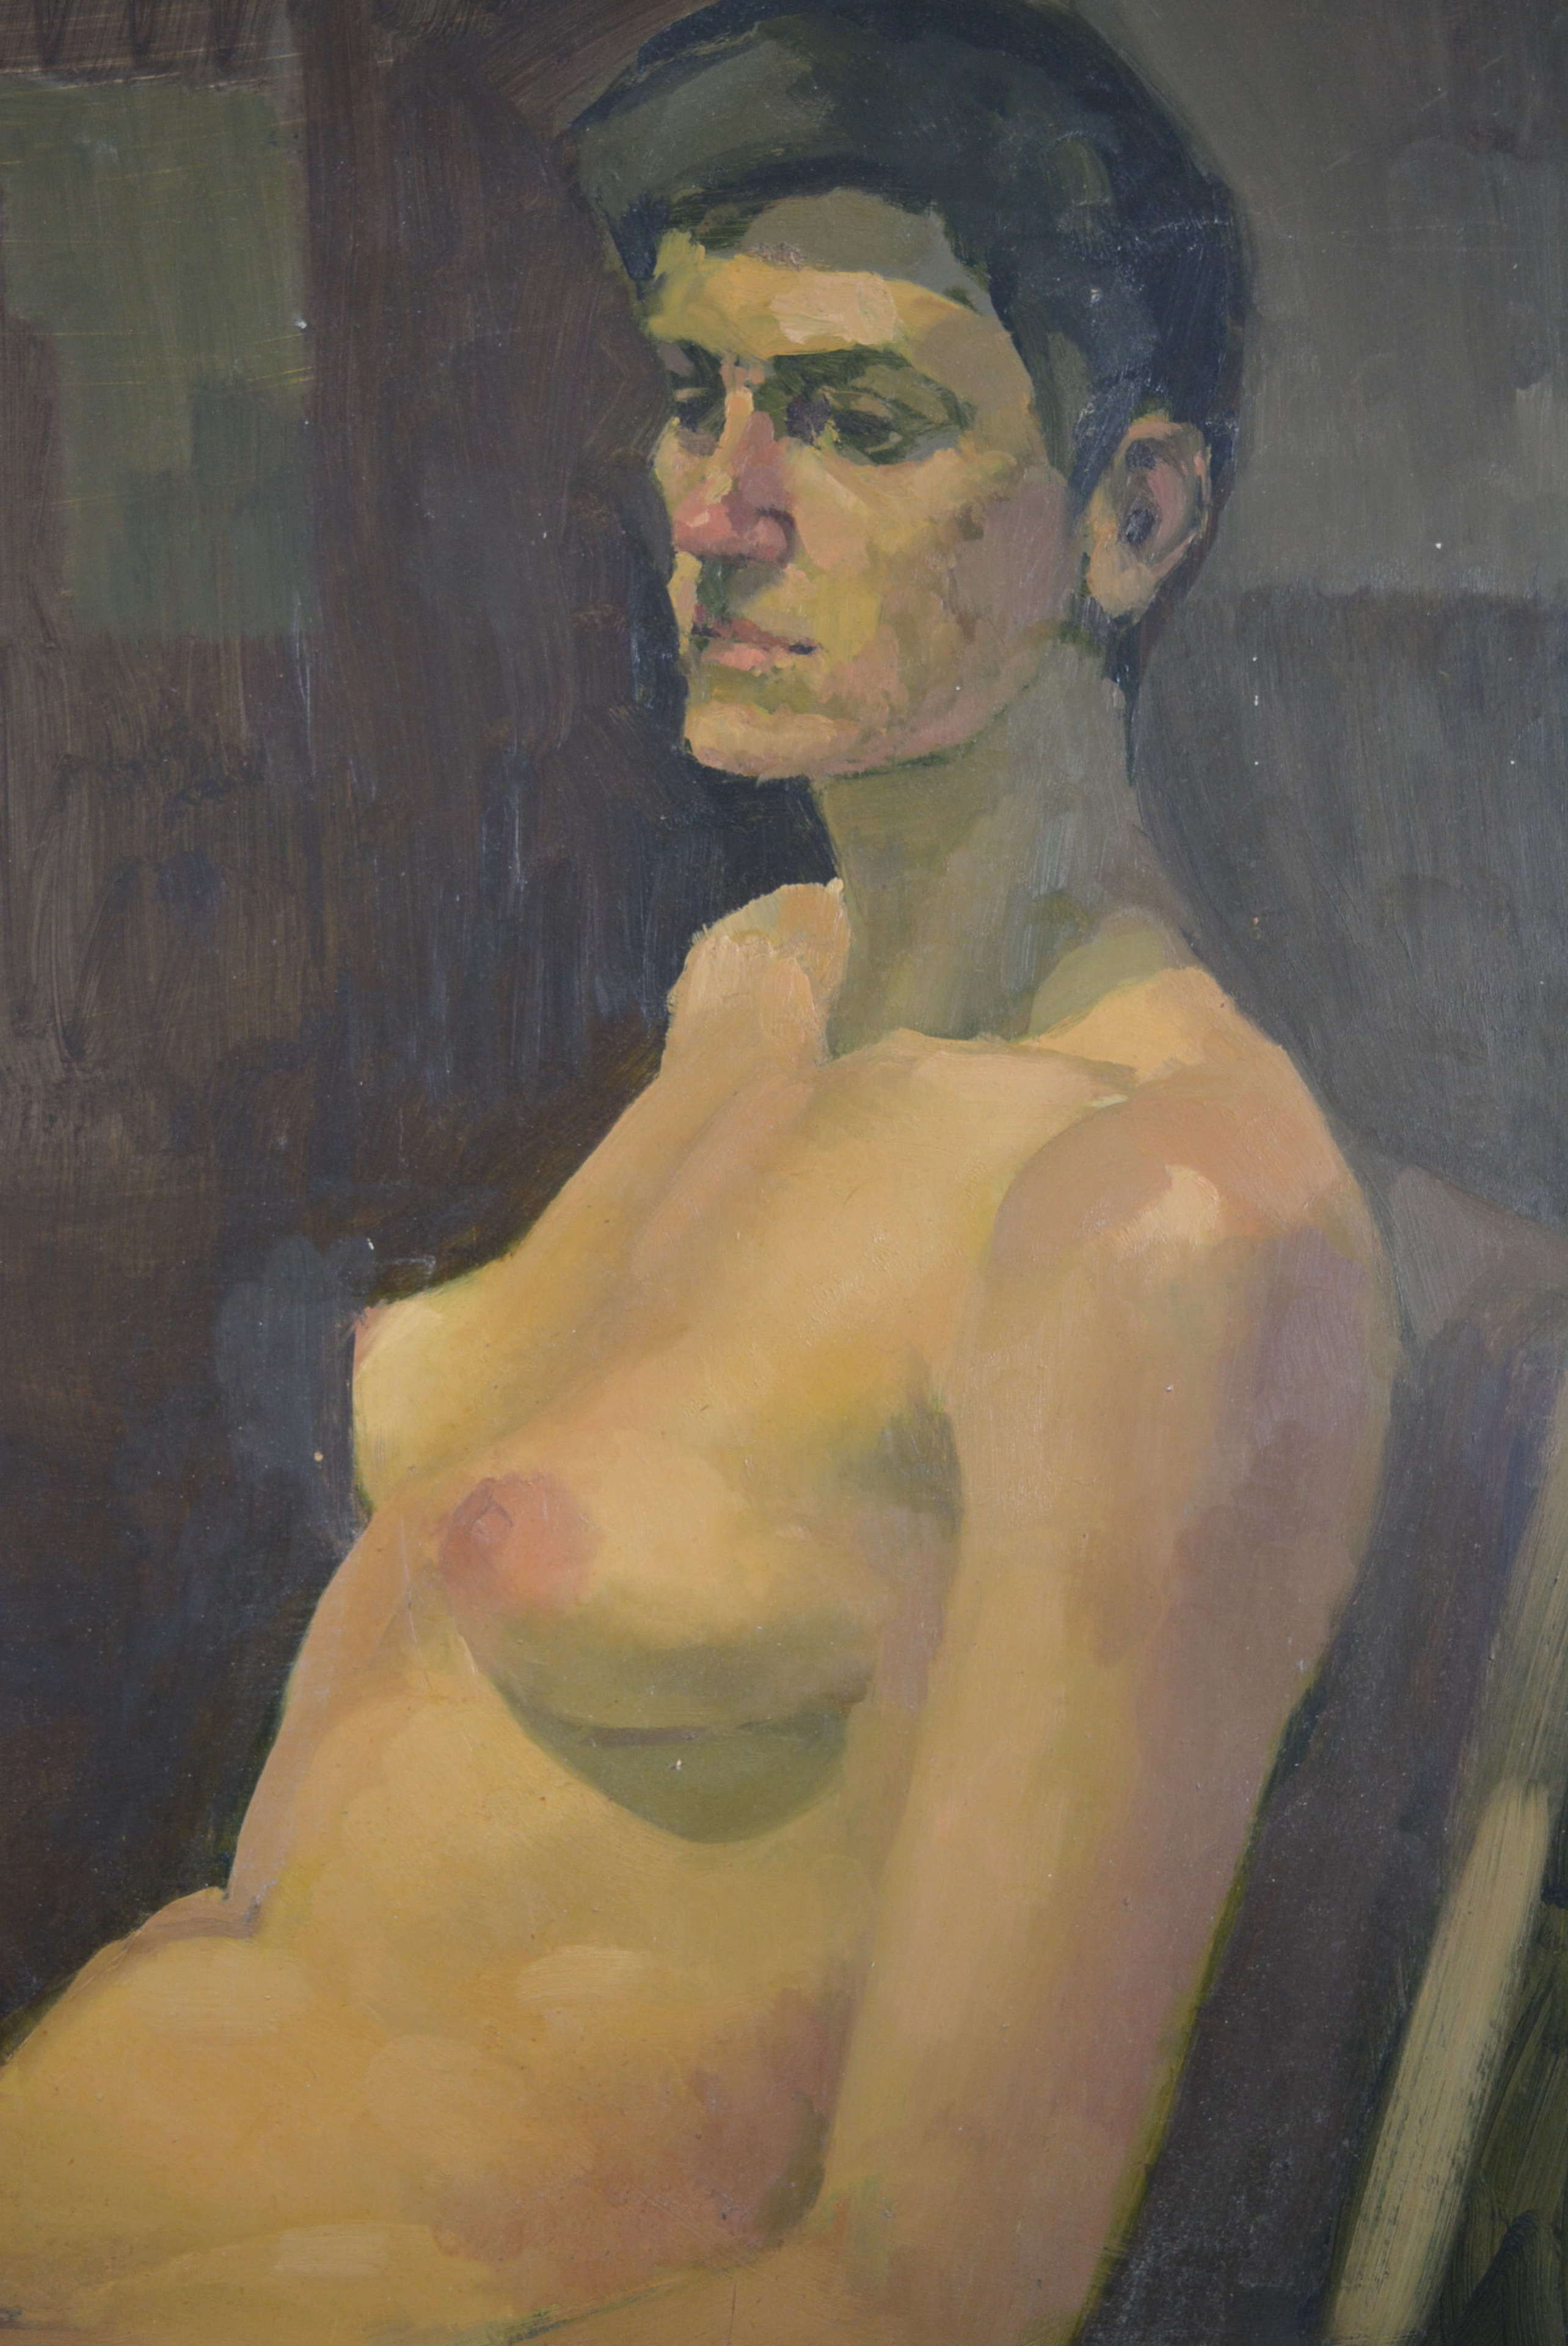 REG ELDRIDGE NUDE STUDY CAROLE - THE MODEL IN PARIS